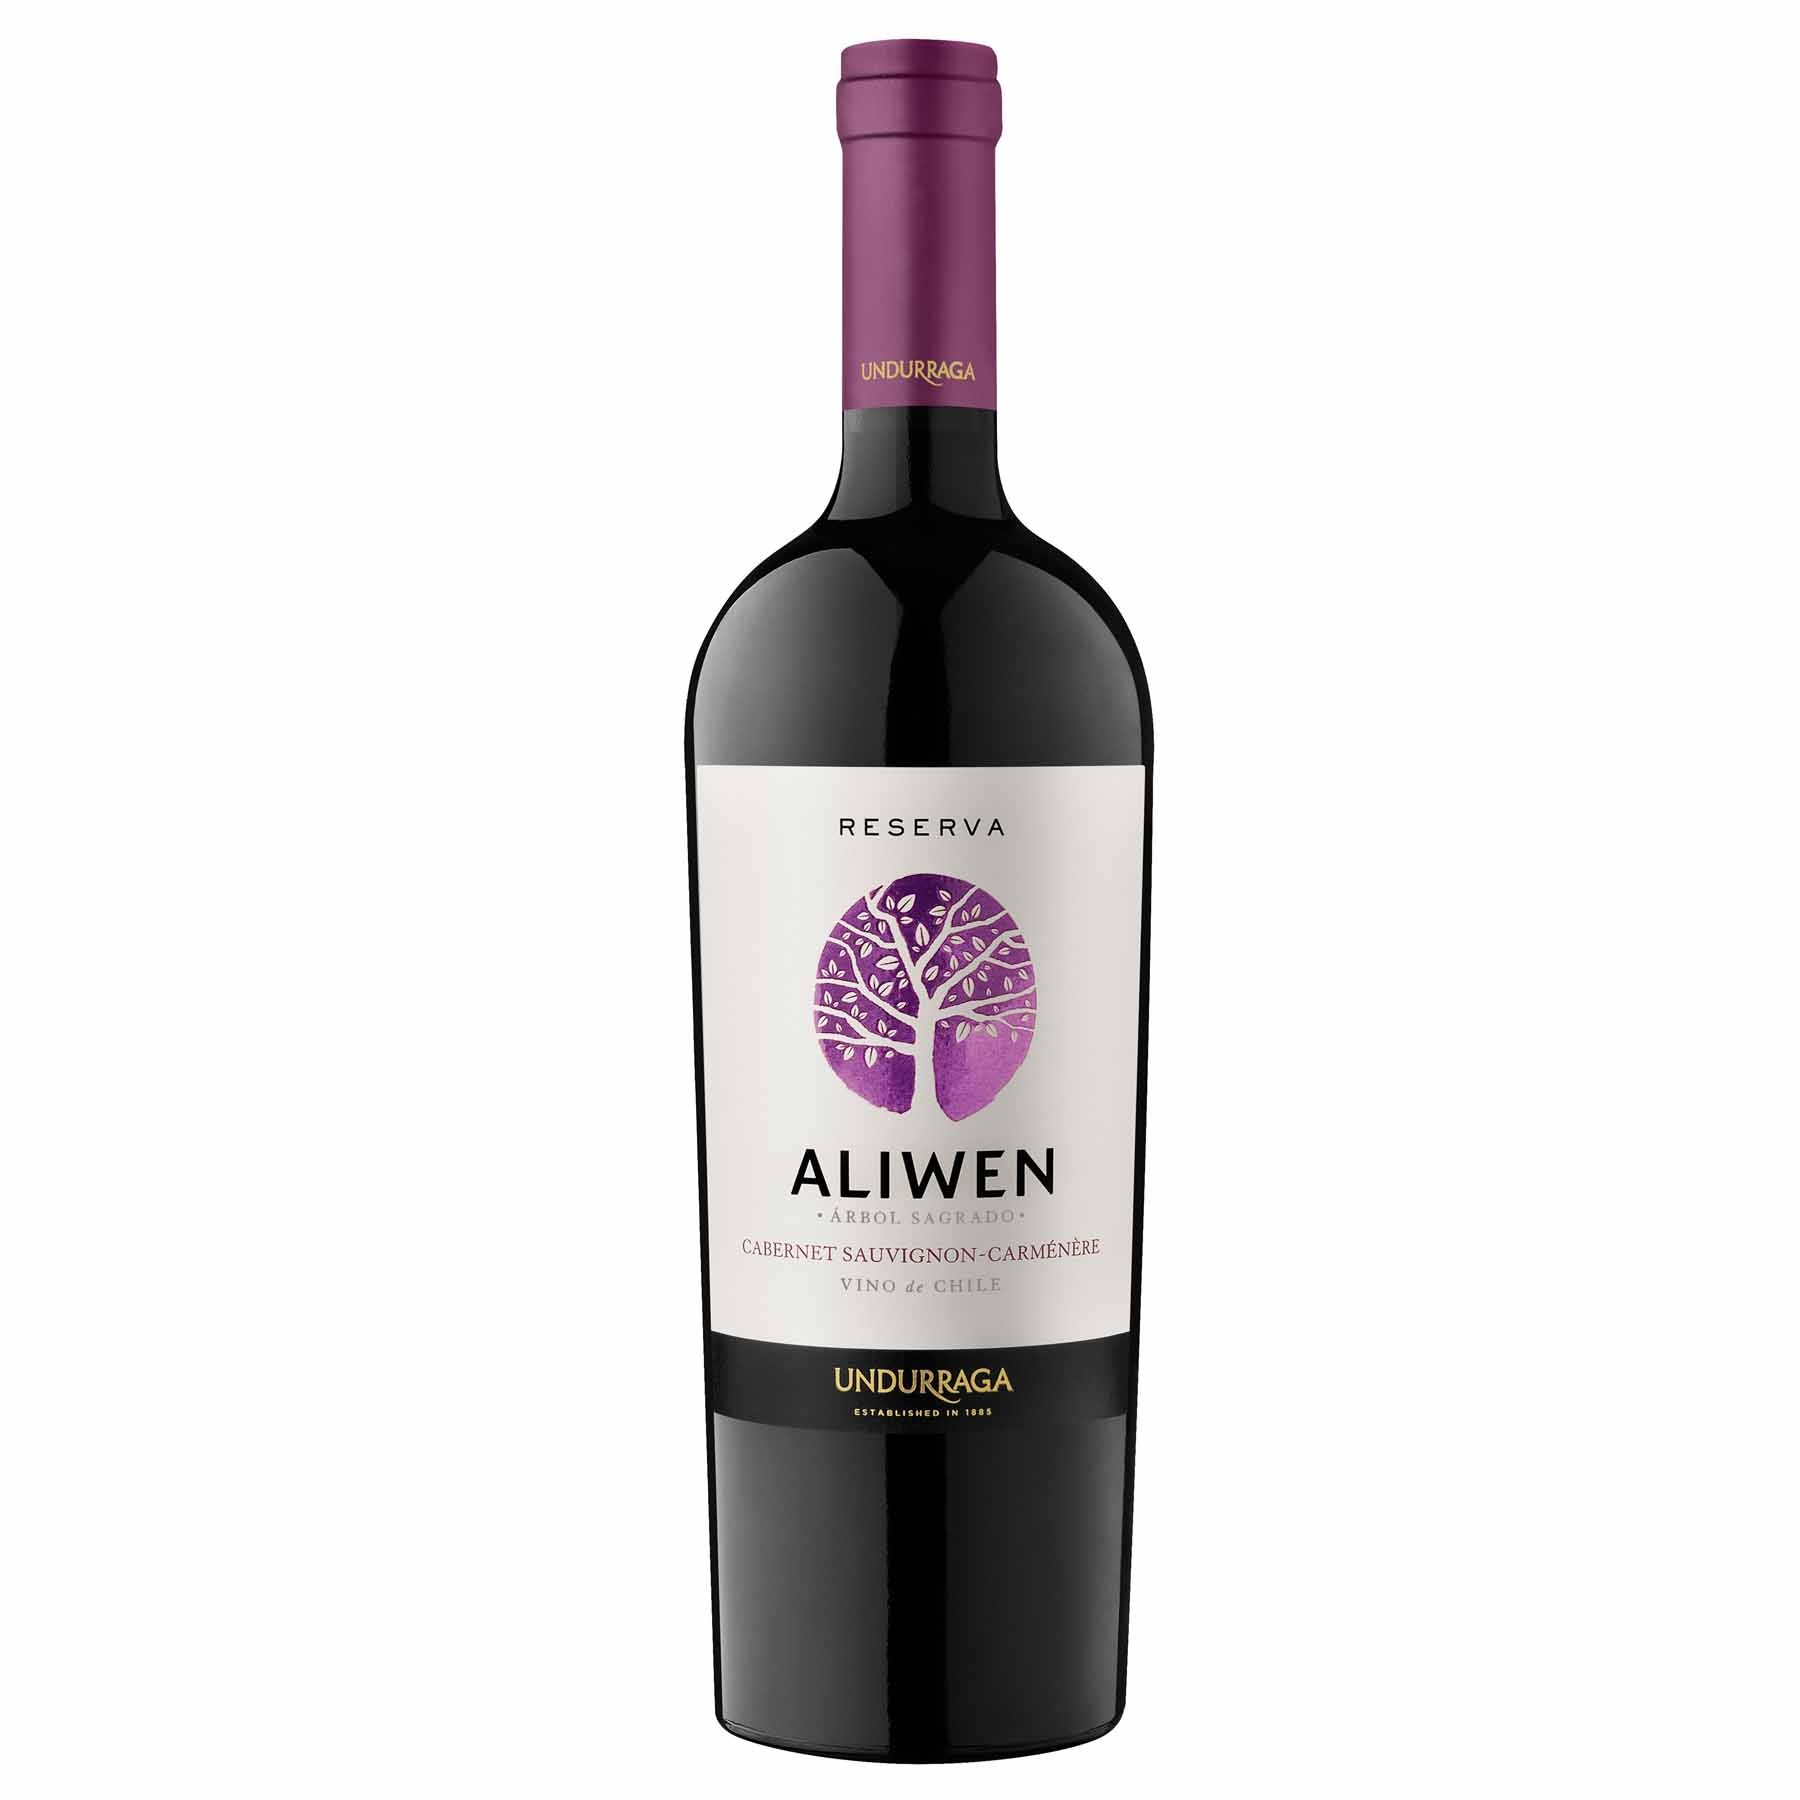 Vinho Tinto Chileno Undurraga Aliwen Reserva Cabernet-Carmenere 2014